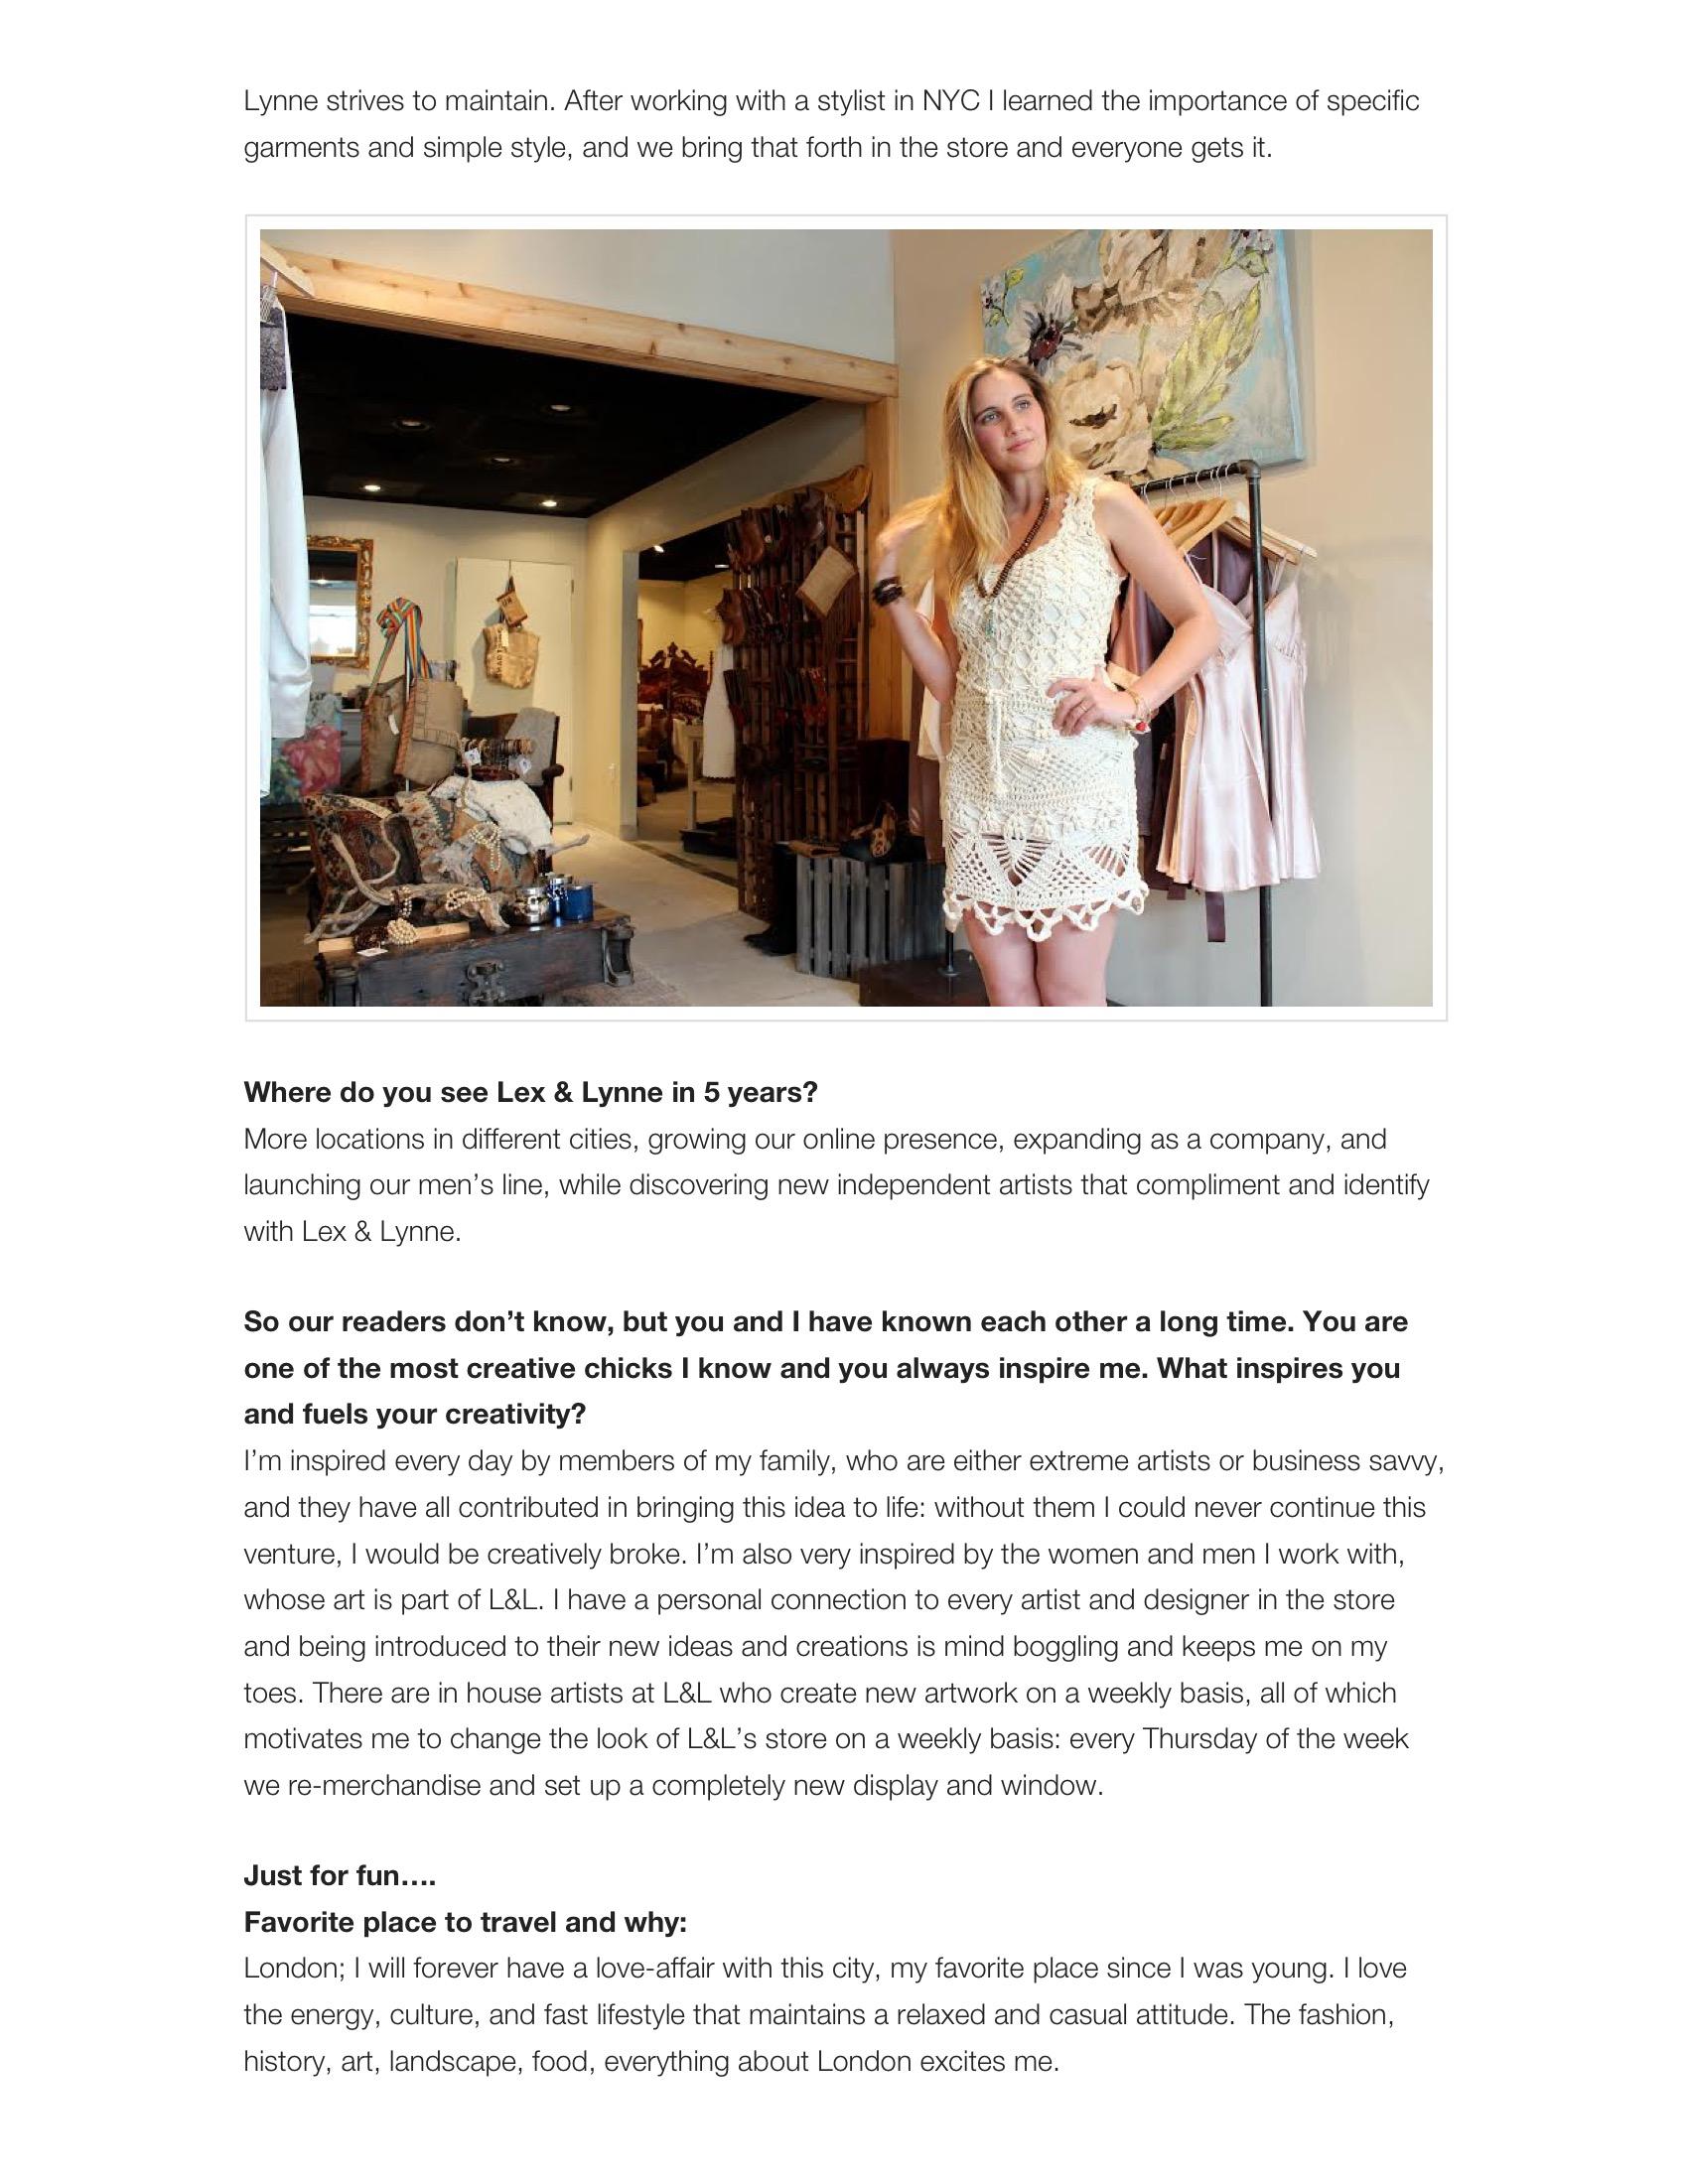 Boss Lady_ Alexis Corry _ Social Stylate 5-5.jpeg